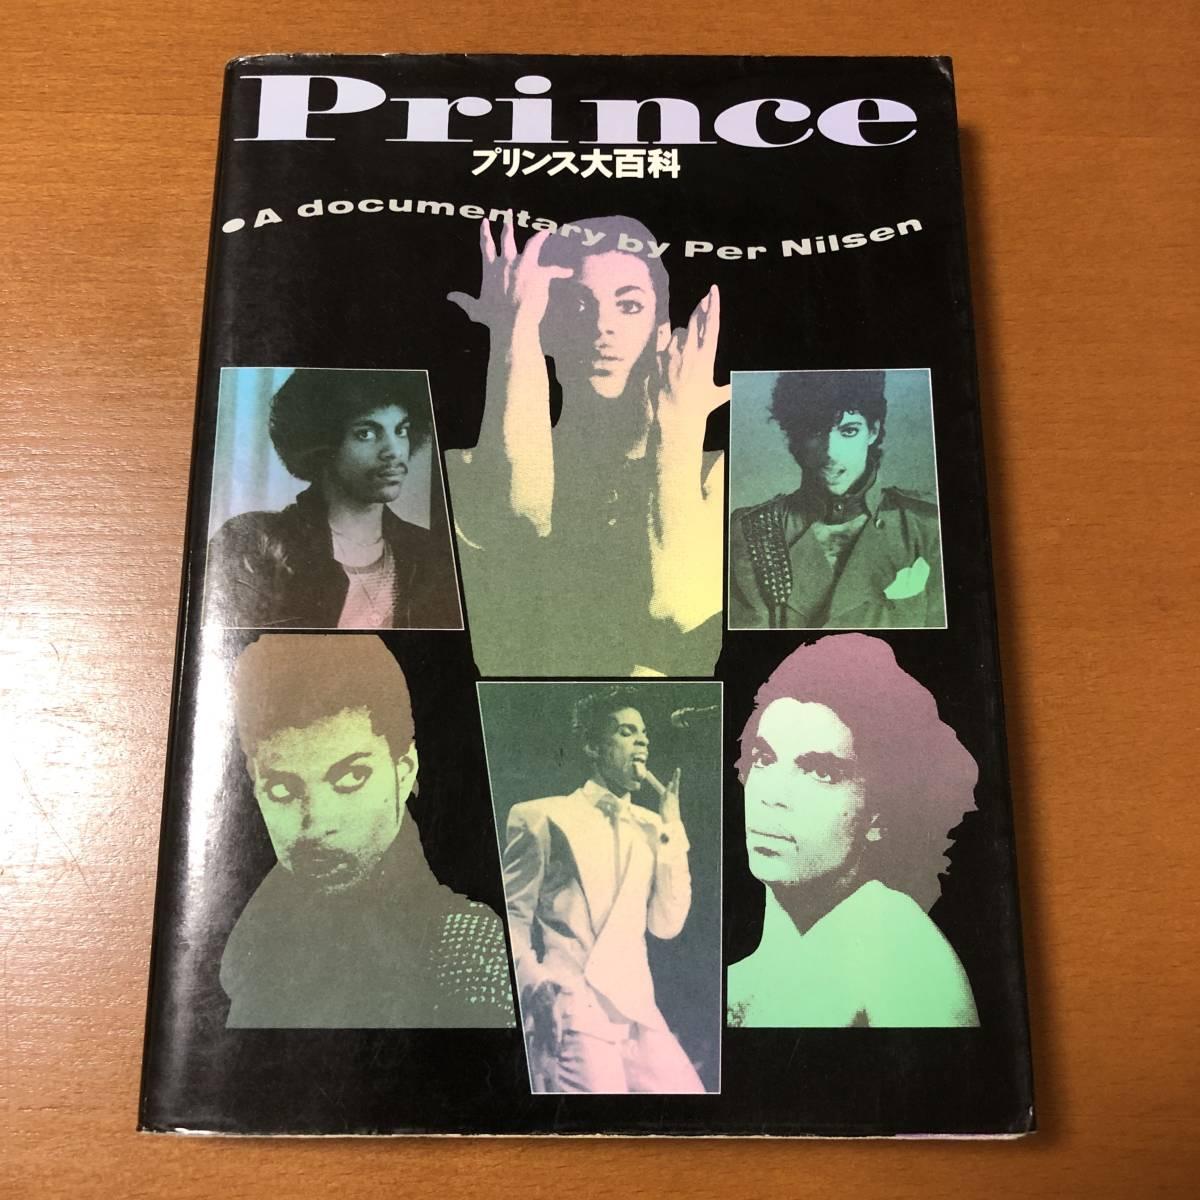 【Prince/プリンス/関連書籍】プリンス大百科 : Prince A DOCUMENTARY by Per Nilsen(初版第1刷)